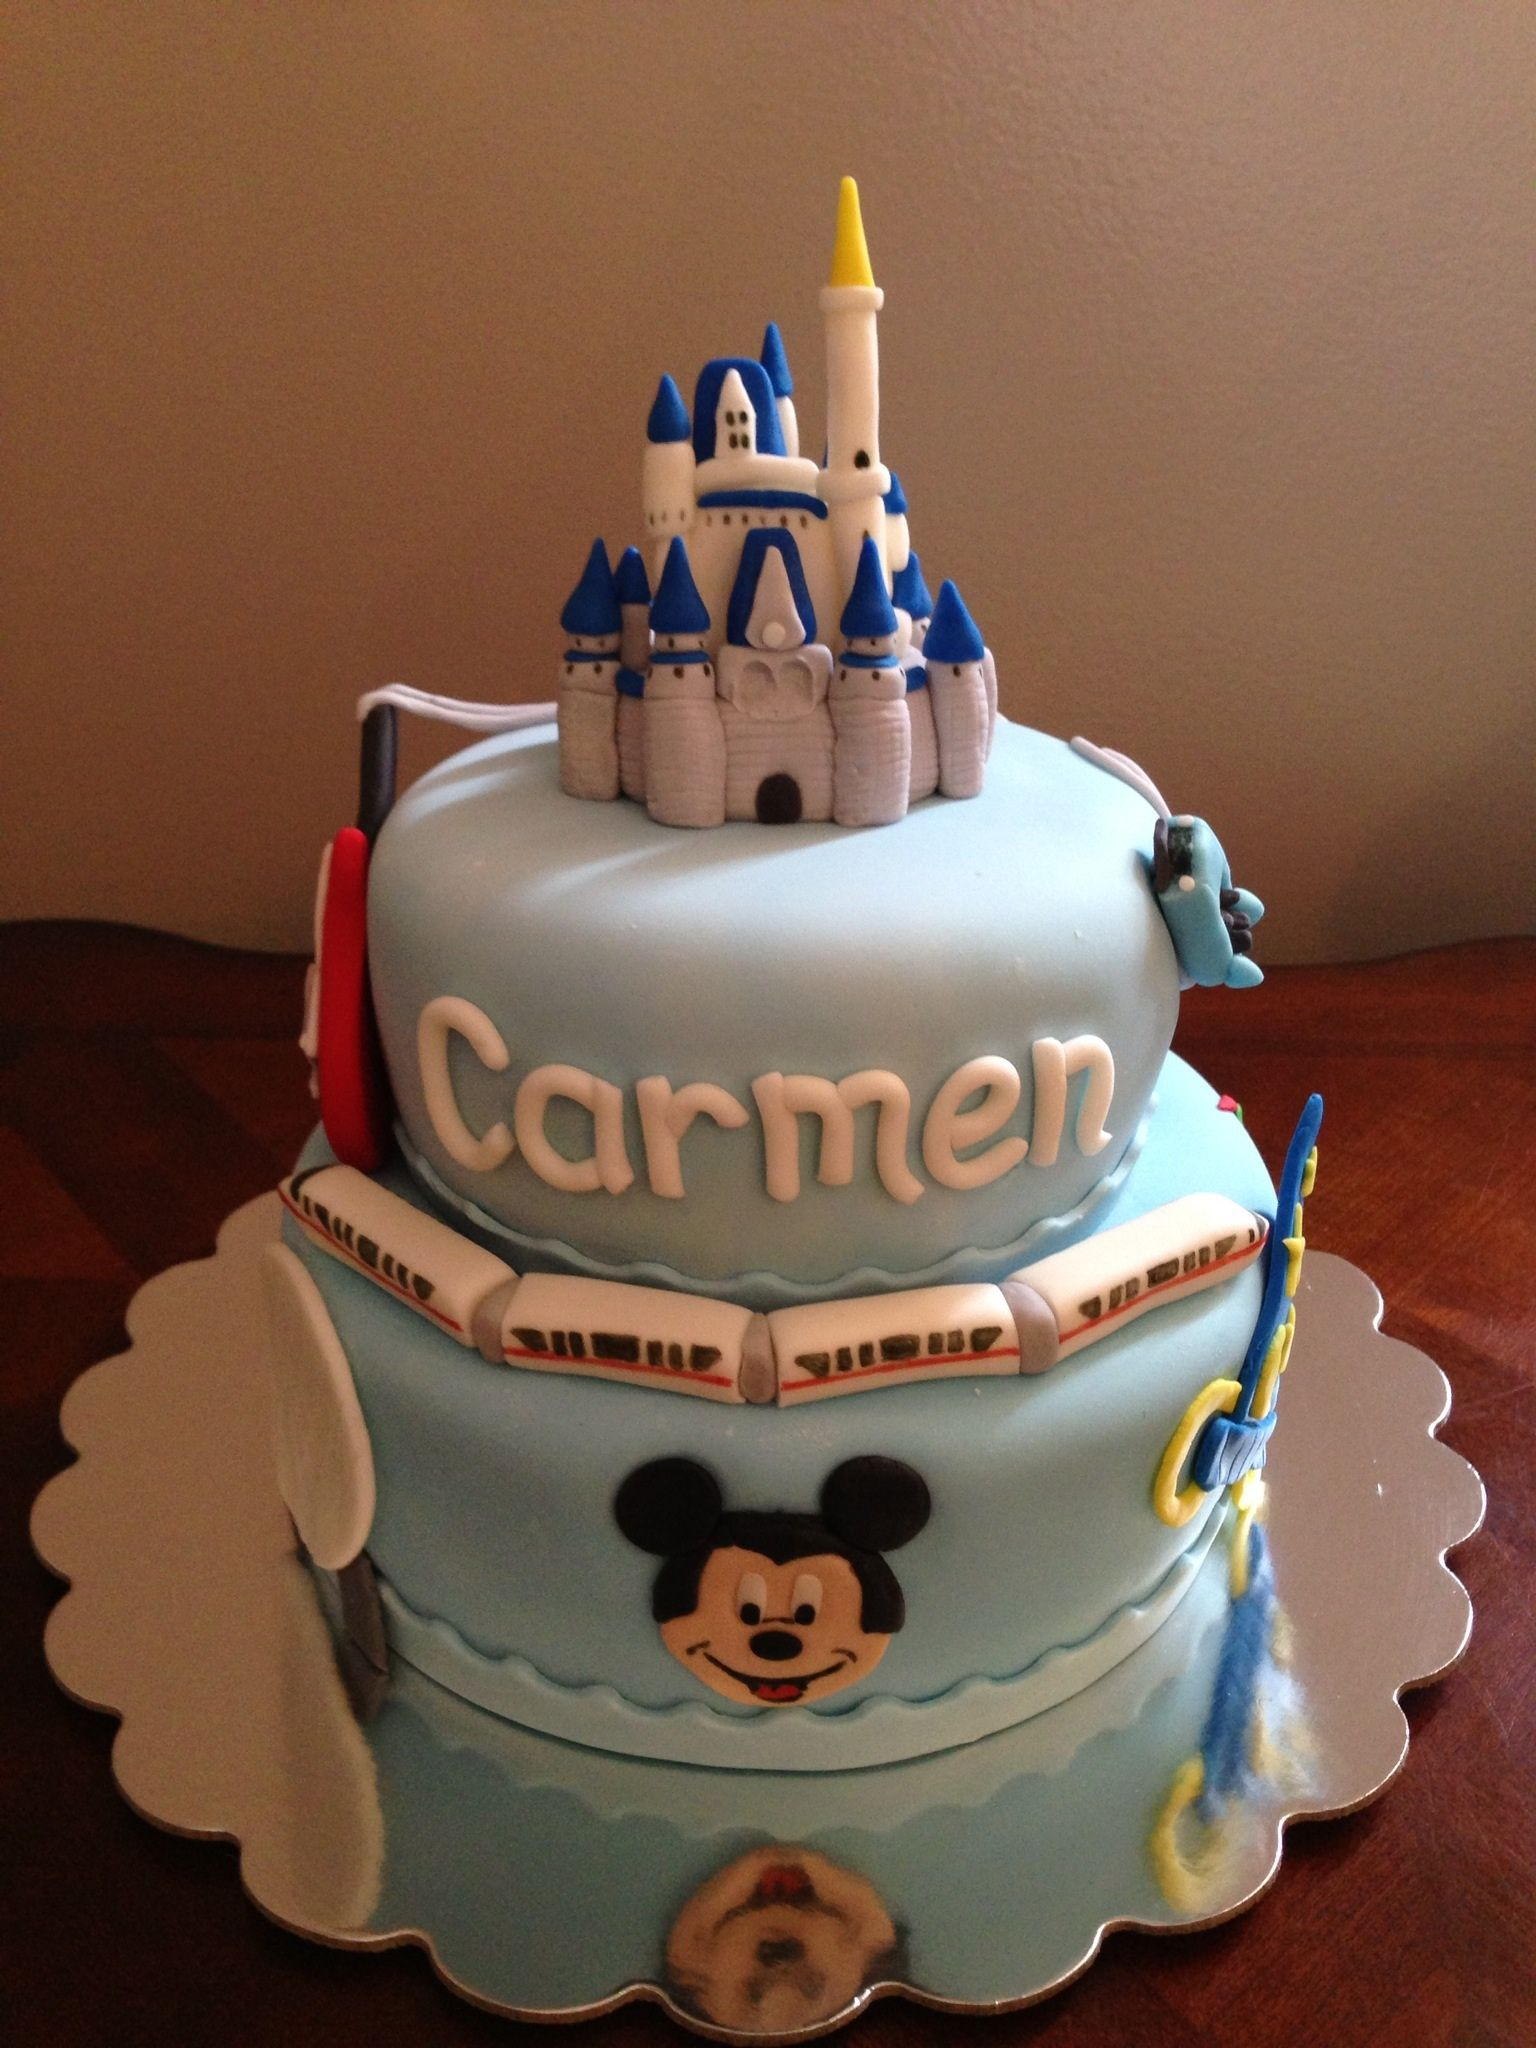 Pleasing Walt Disney World Theme Tiered Cake With Images Disney World Funny Birthday Cards Online Alyptdamsfinfo